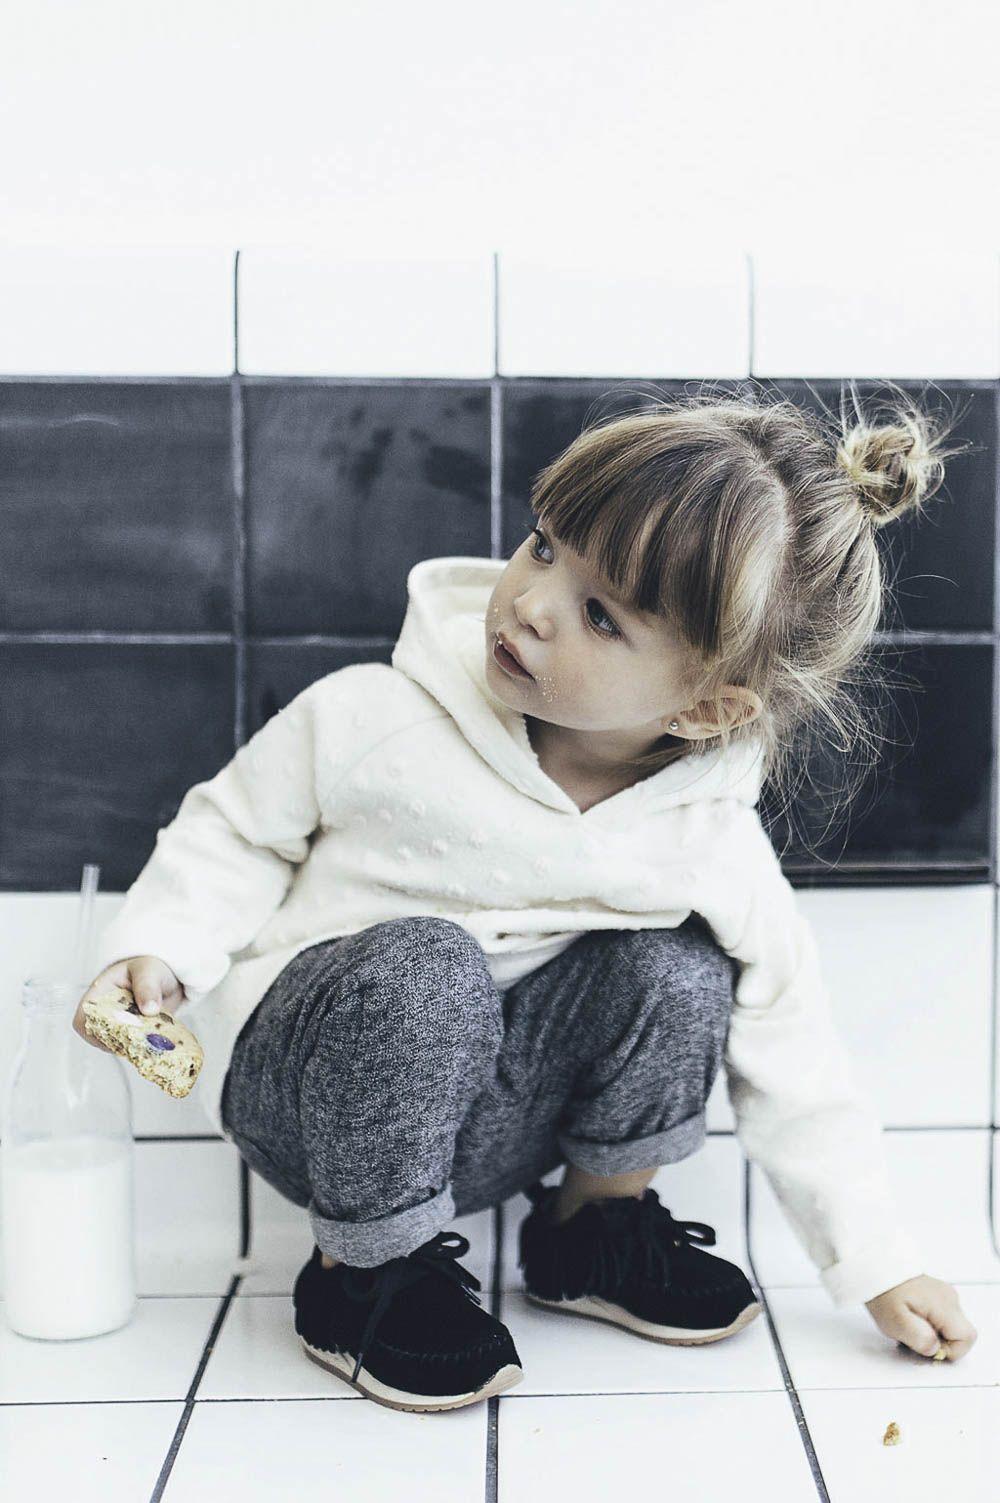 Kinderkleding Kids.Zara Kids Budget Kinderkleding Capsule Collectie Kindermodeblog 9